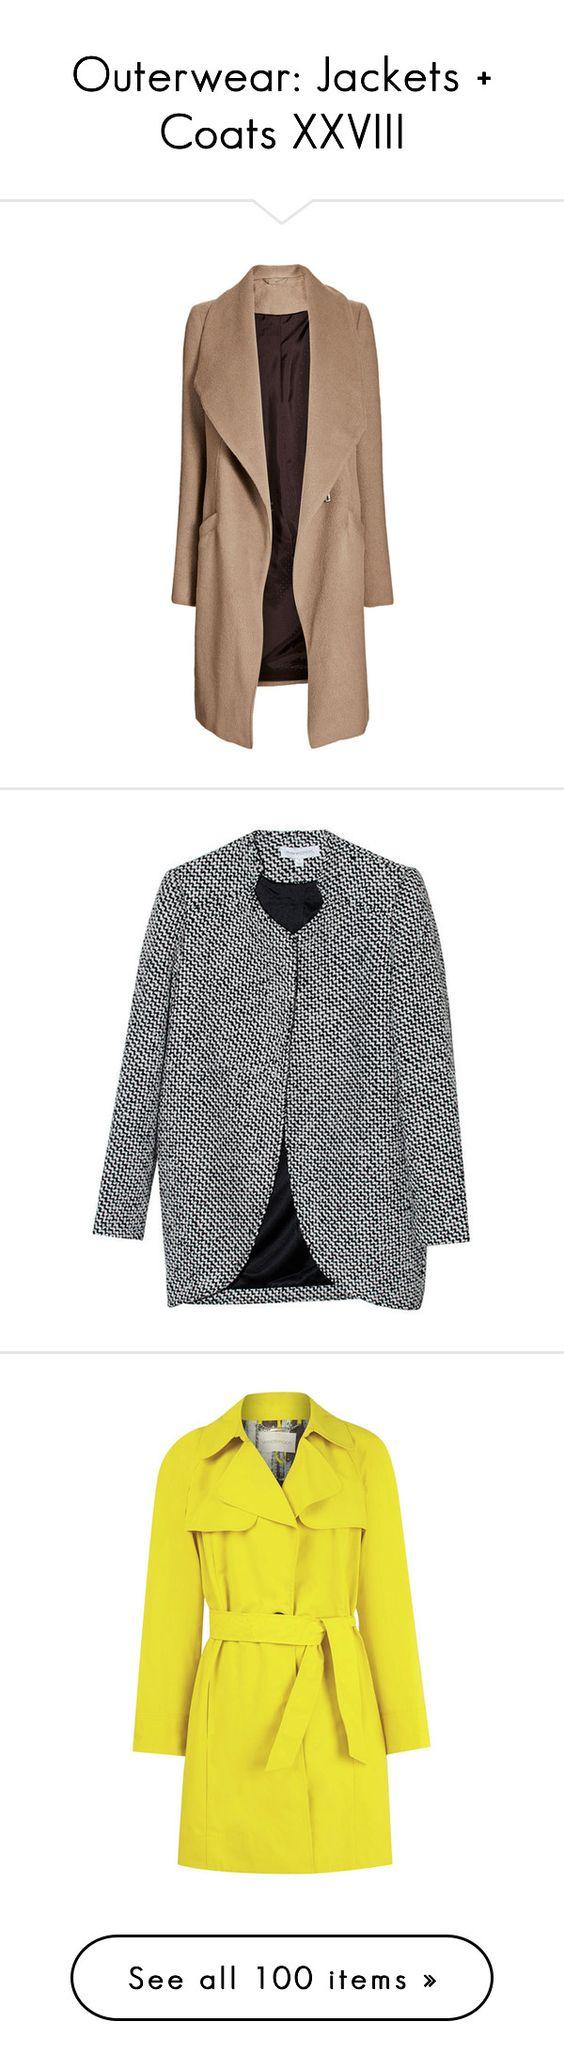 """Outerwear: Jackets + Coats XXVIII"" by jay-to-the-kay ❤ liked on Polyvore featuring blazers, jackets, outerwear, coats, coats & jackets, tops, beige coat, camel waterfall coat, women coats e camel coat"